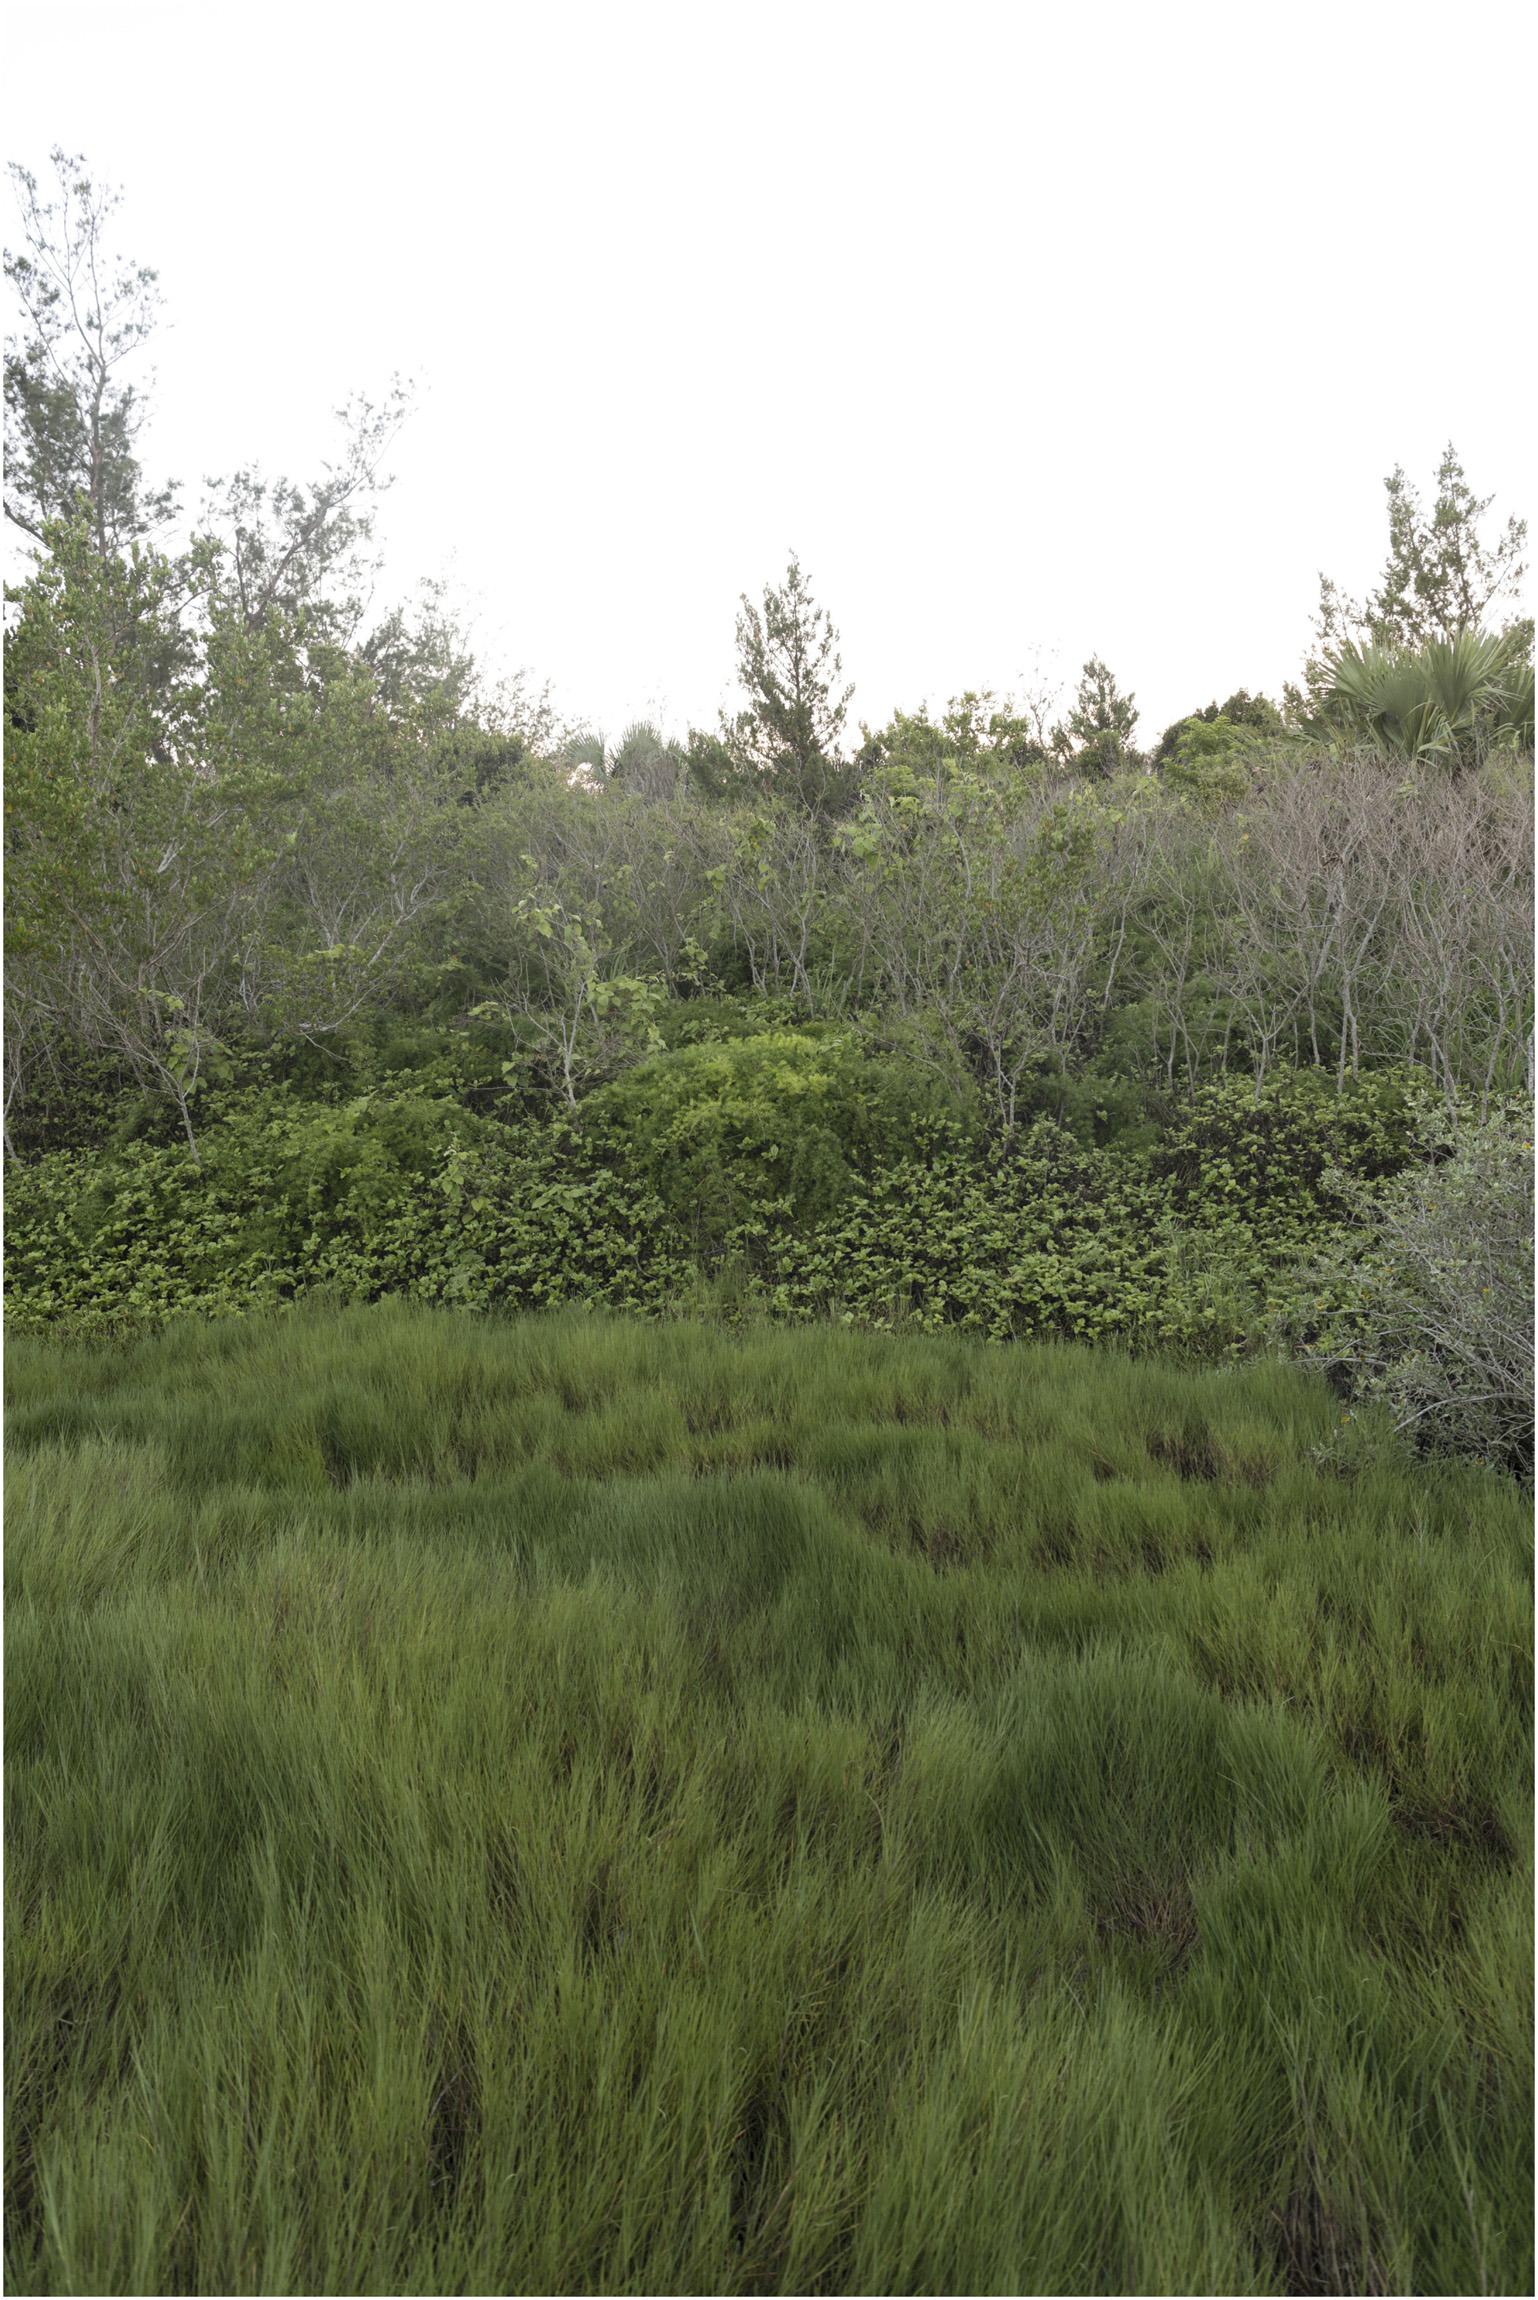 ©FianderFoto_Winnow_Five Senses Wild Edible Herbal Tour_008.jpg